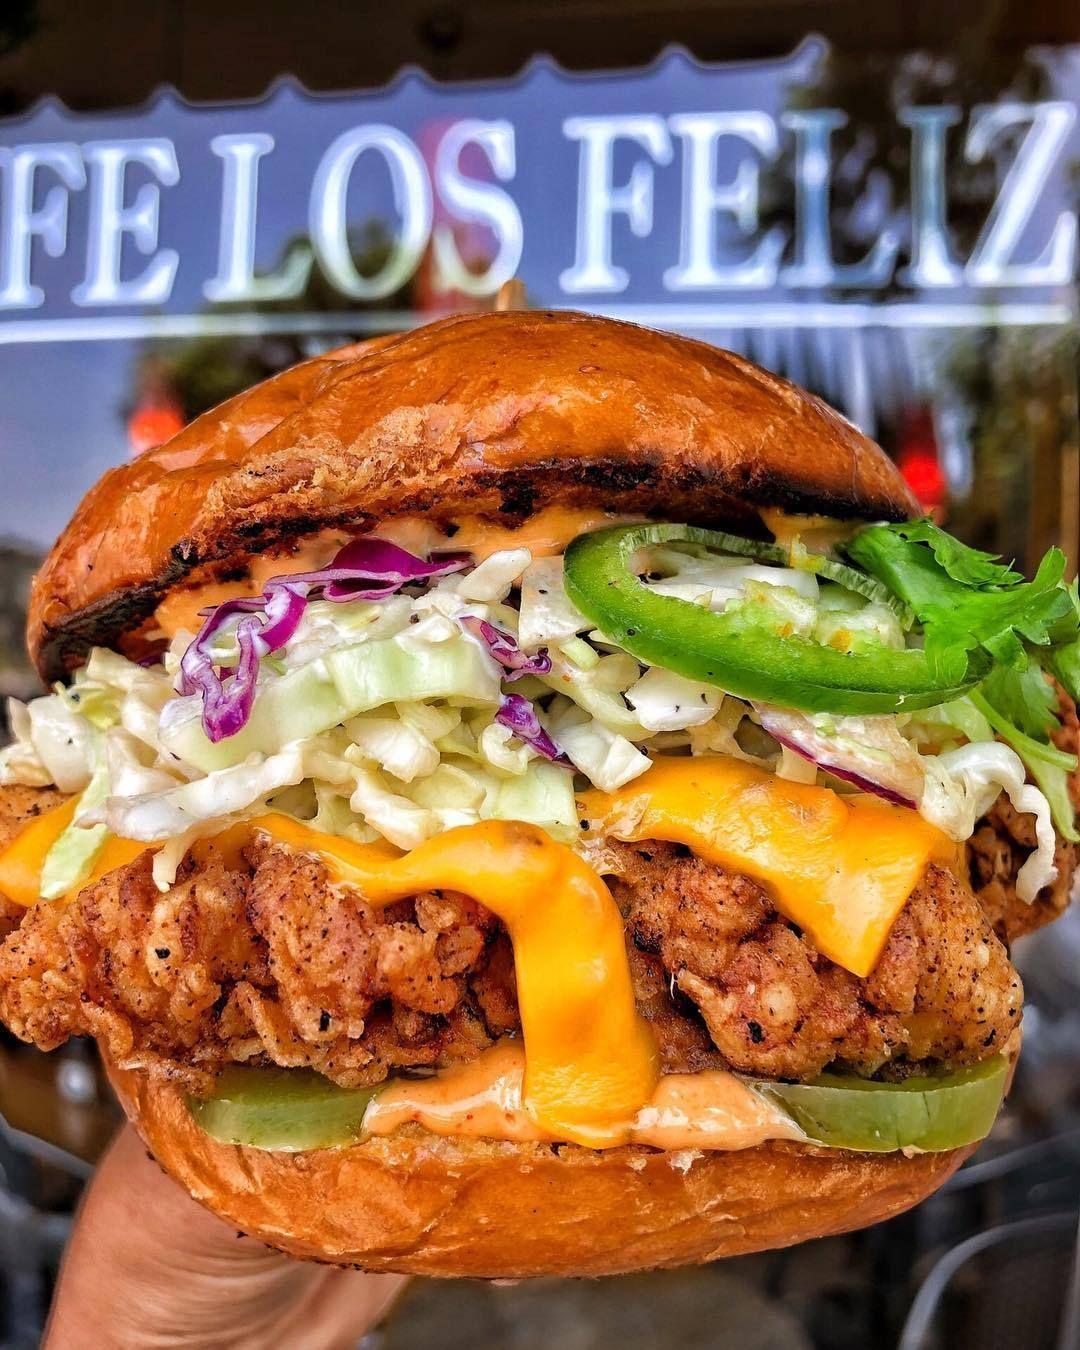 Everybody Loves To Eat Photo Food Crispy Chicken Sandwich From Cafe Losfeliz Buttermilk Fried Chicken In 2020 Fried Chicken Burger Chicken Sandwich Food Goals